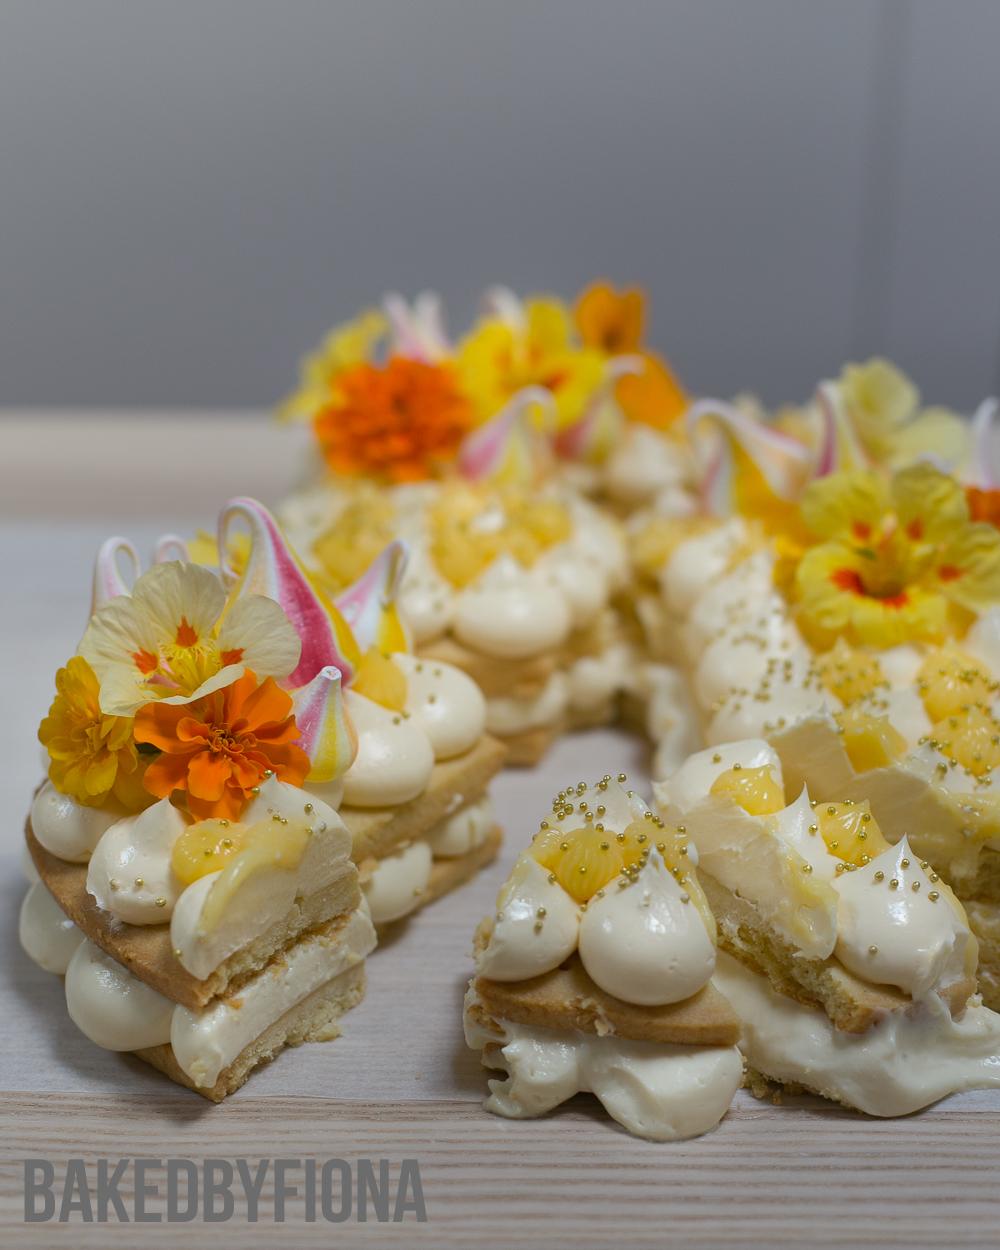 Sydney Cakes BakedByFiona custom biscuit cake